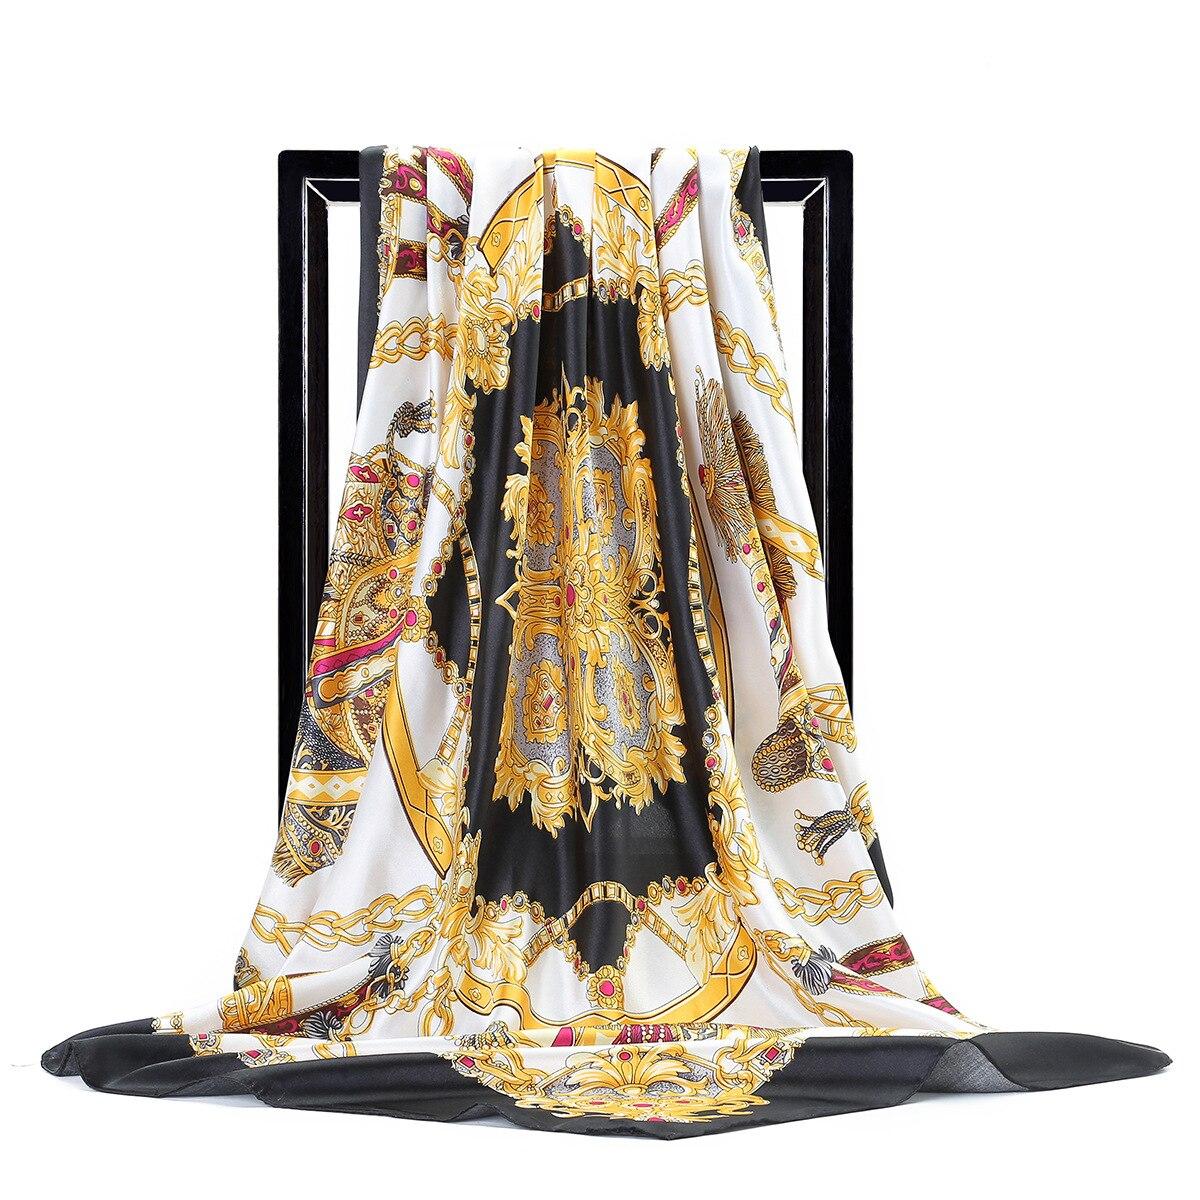 2020 Luxury Brand Silk Scarves Fashion Spring Autumn Women Tourism Flower Square Scarf Seaside Sunscreen Quality Shawl Print